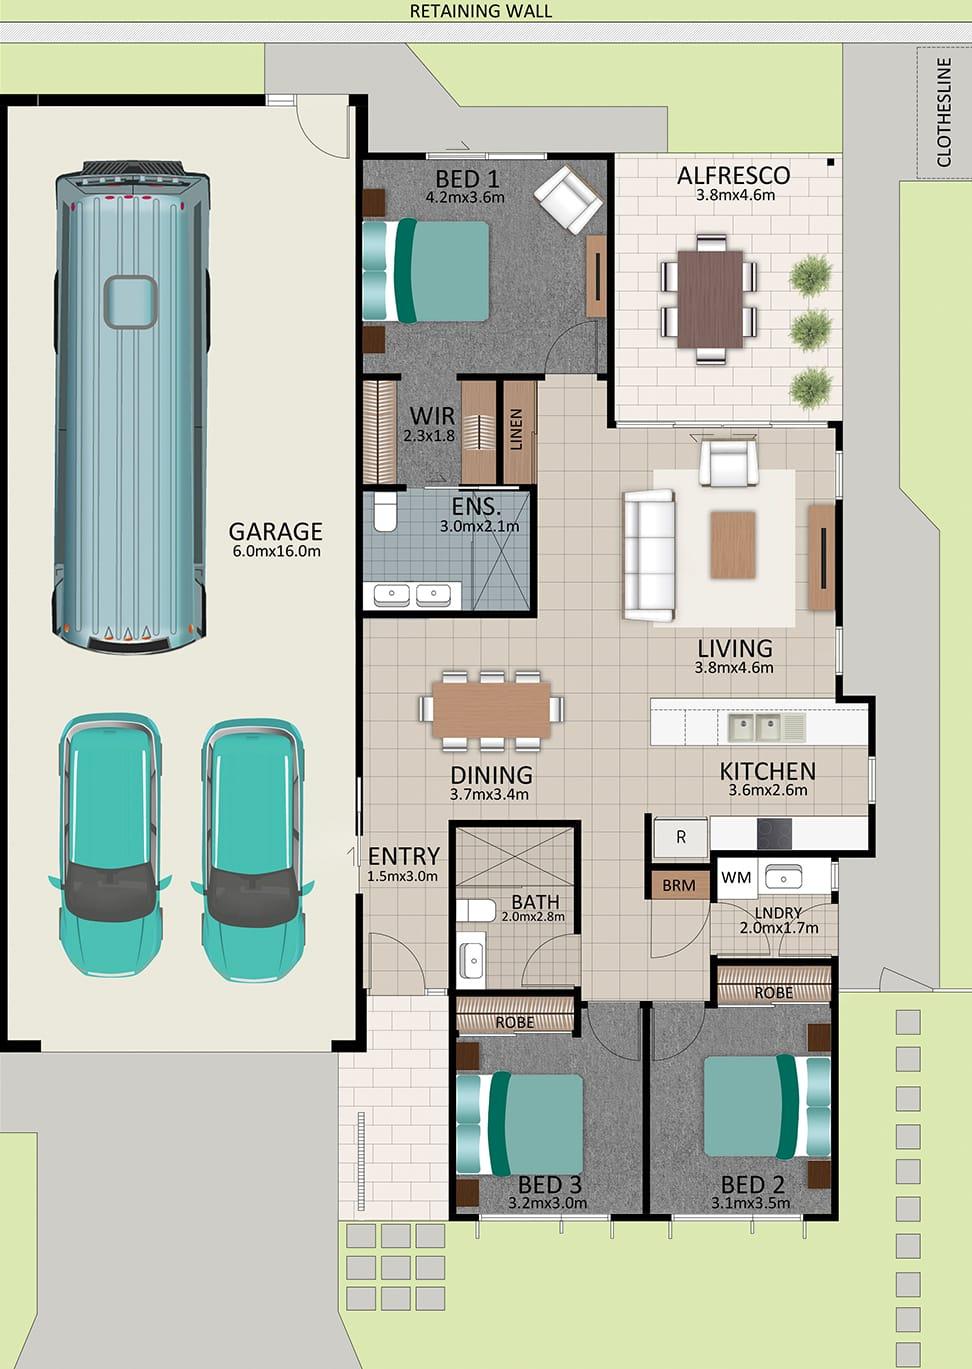 LAT25 Floorplan GAL OCT20 LOT 214 - Lot 214